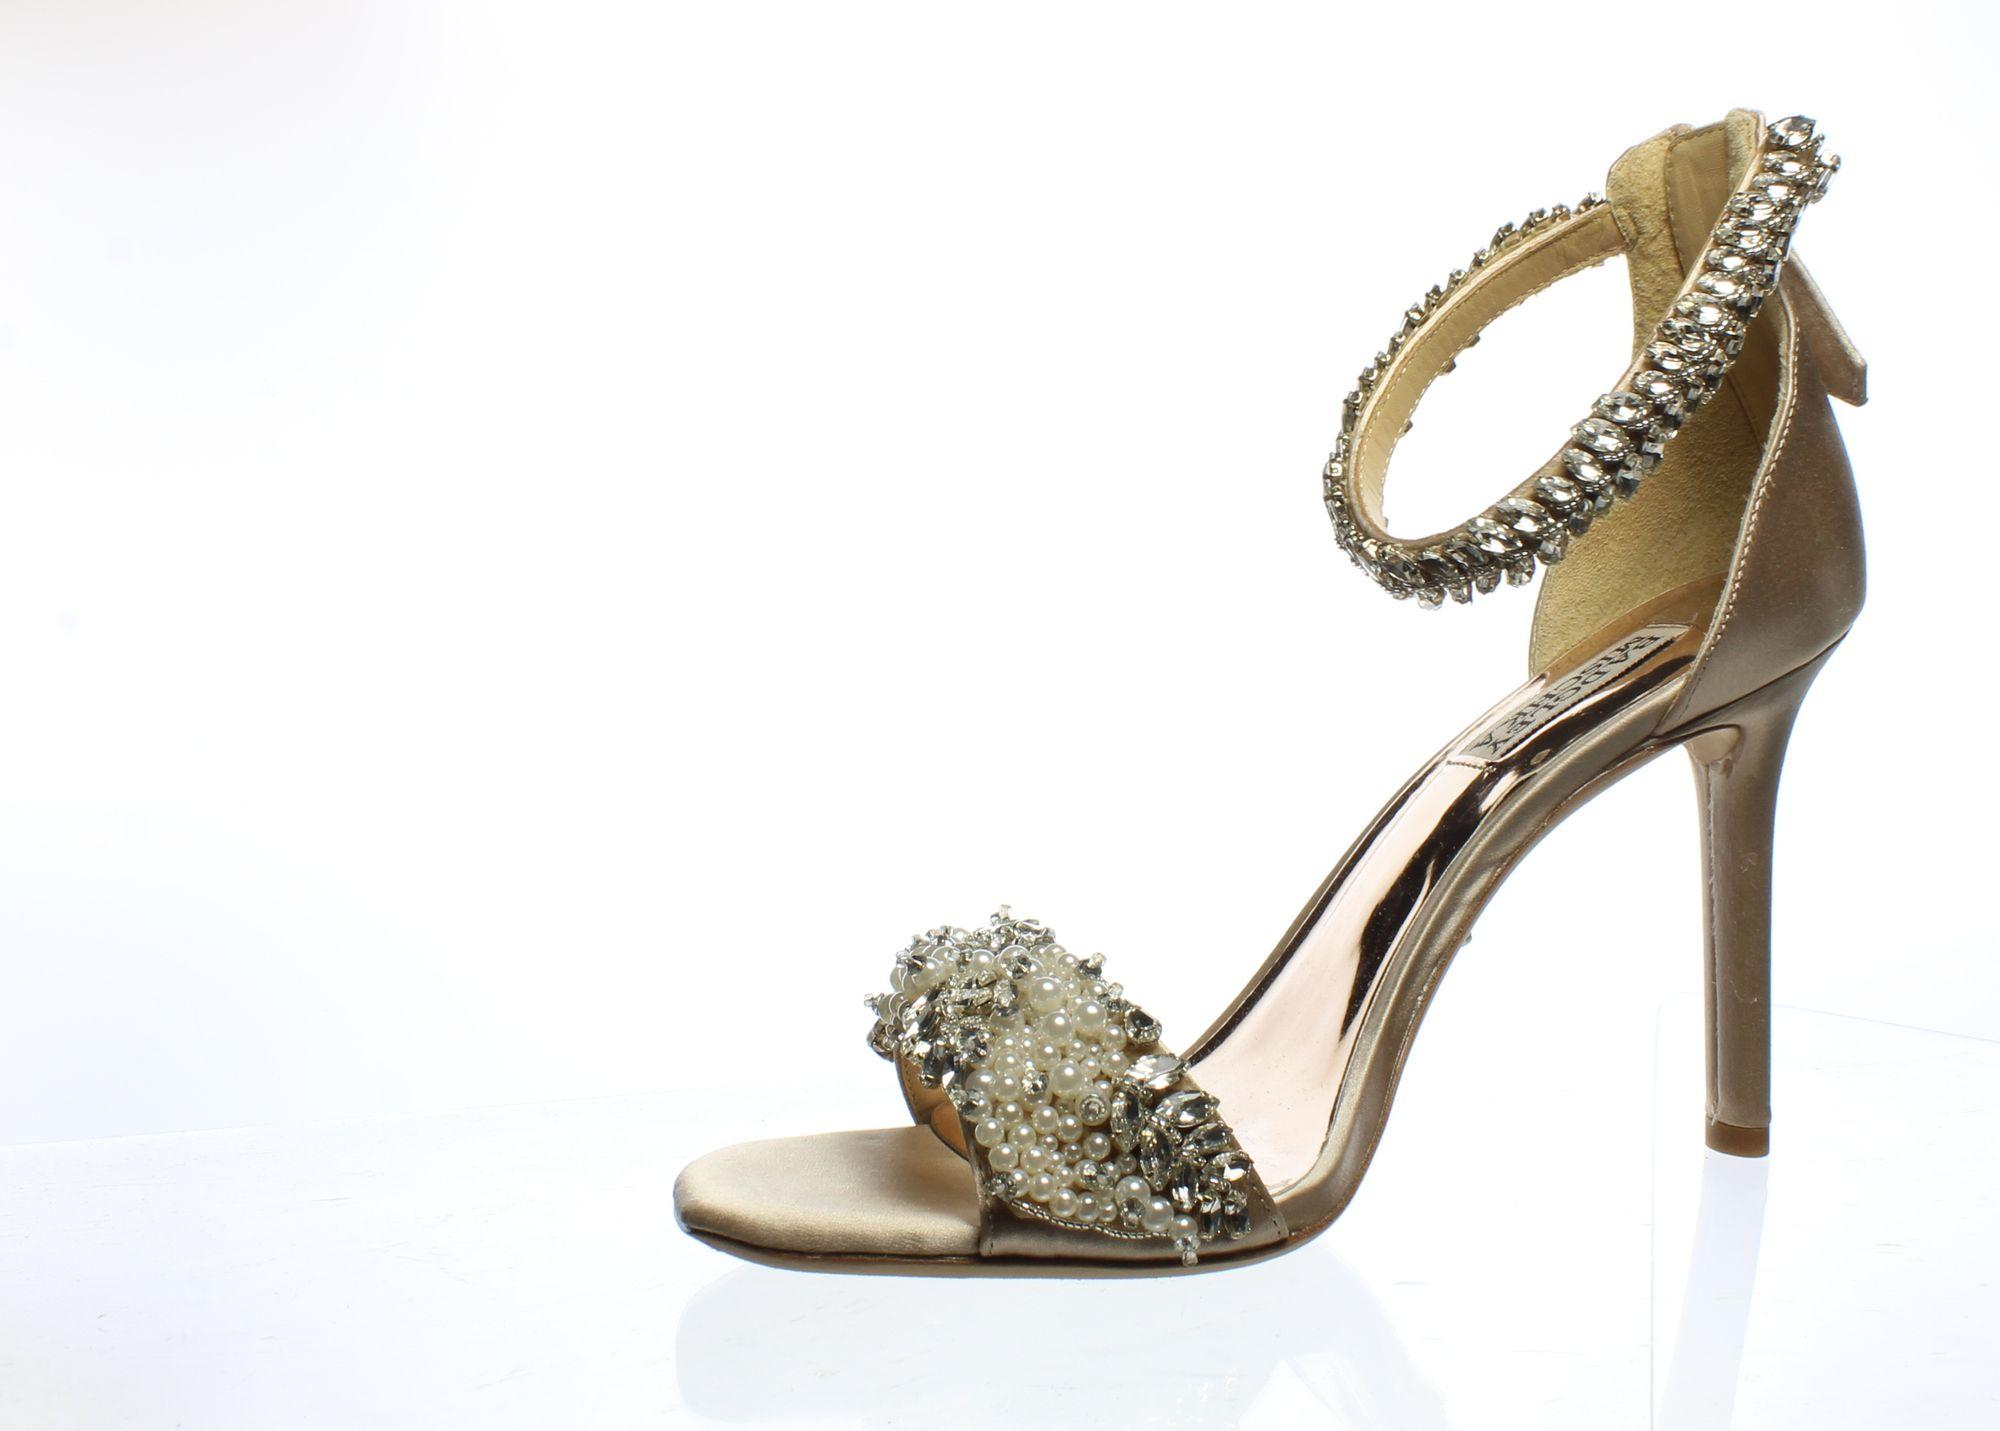 Badgley Mischka Womens Roxy Nude Ankle Strap Heels Size 8